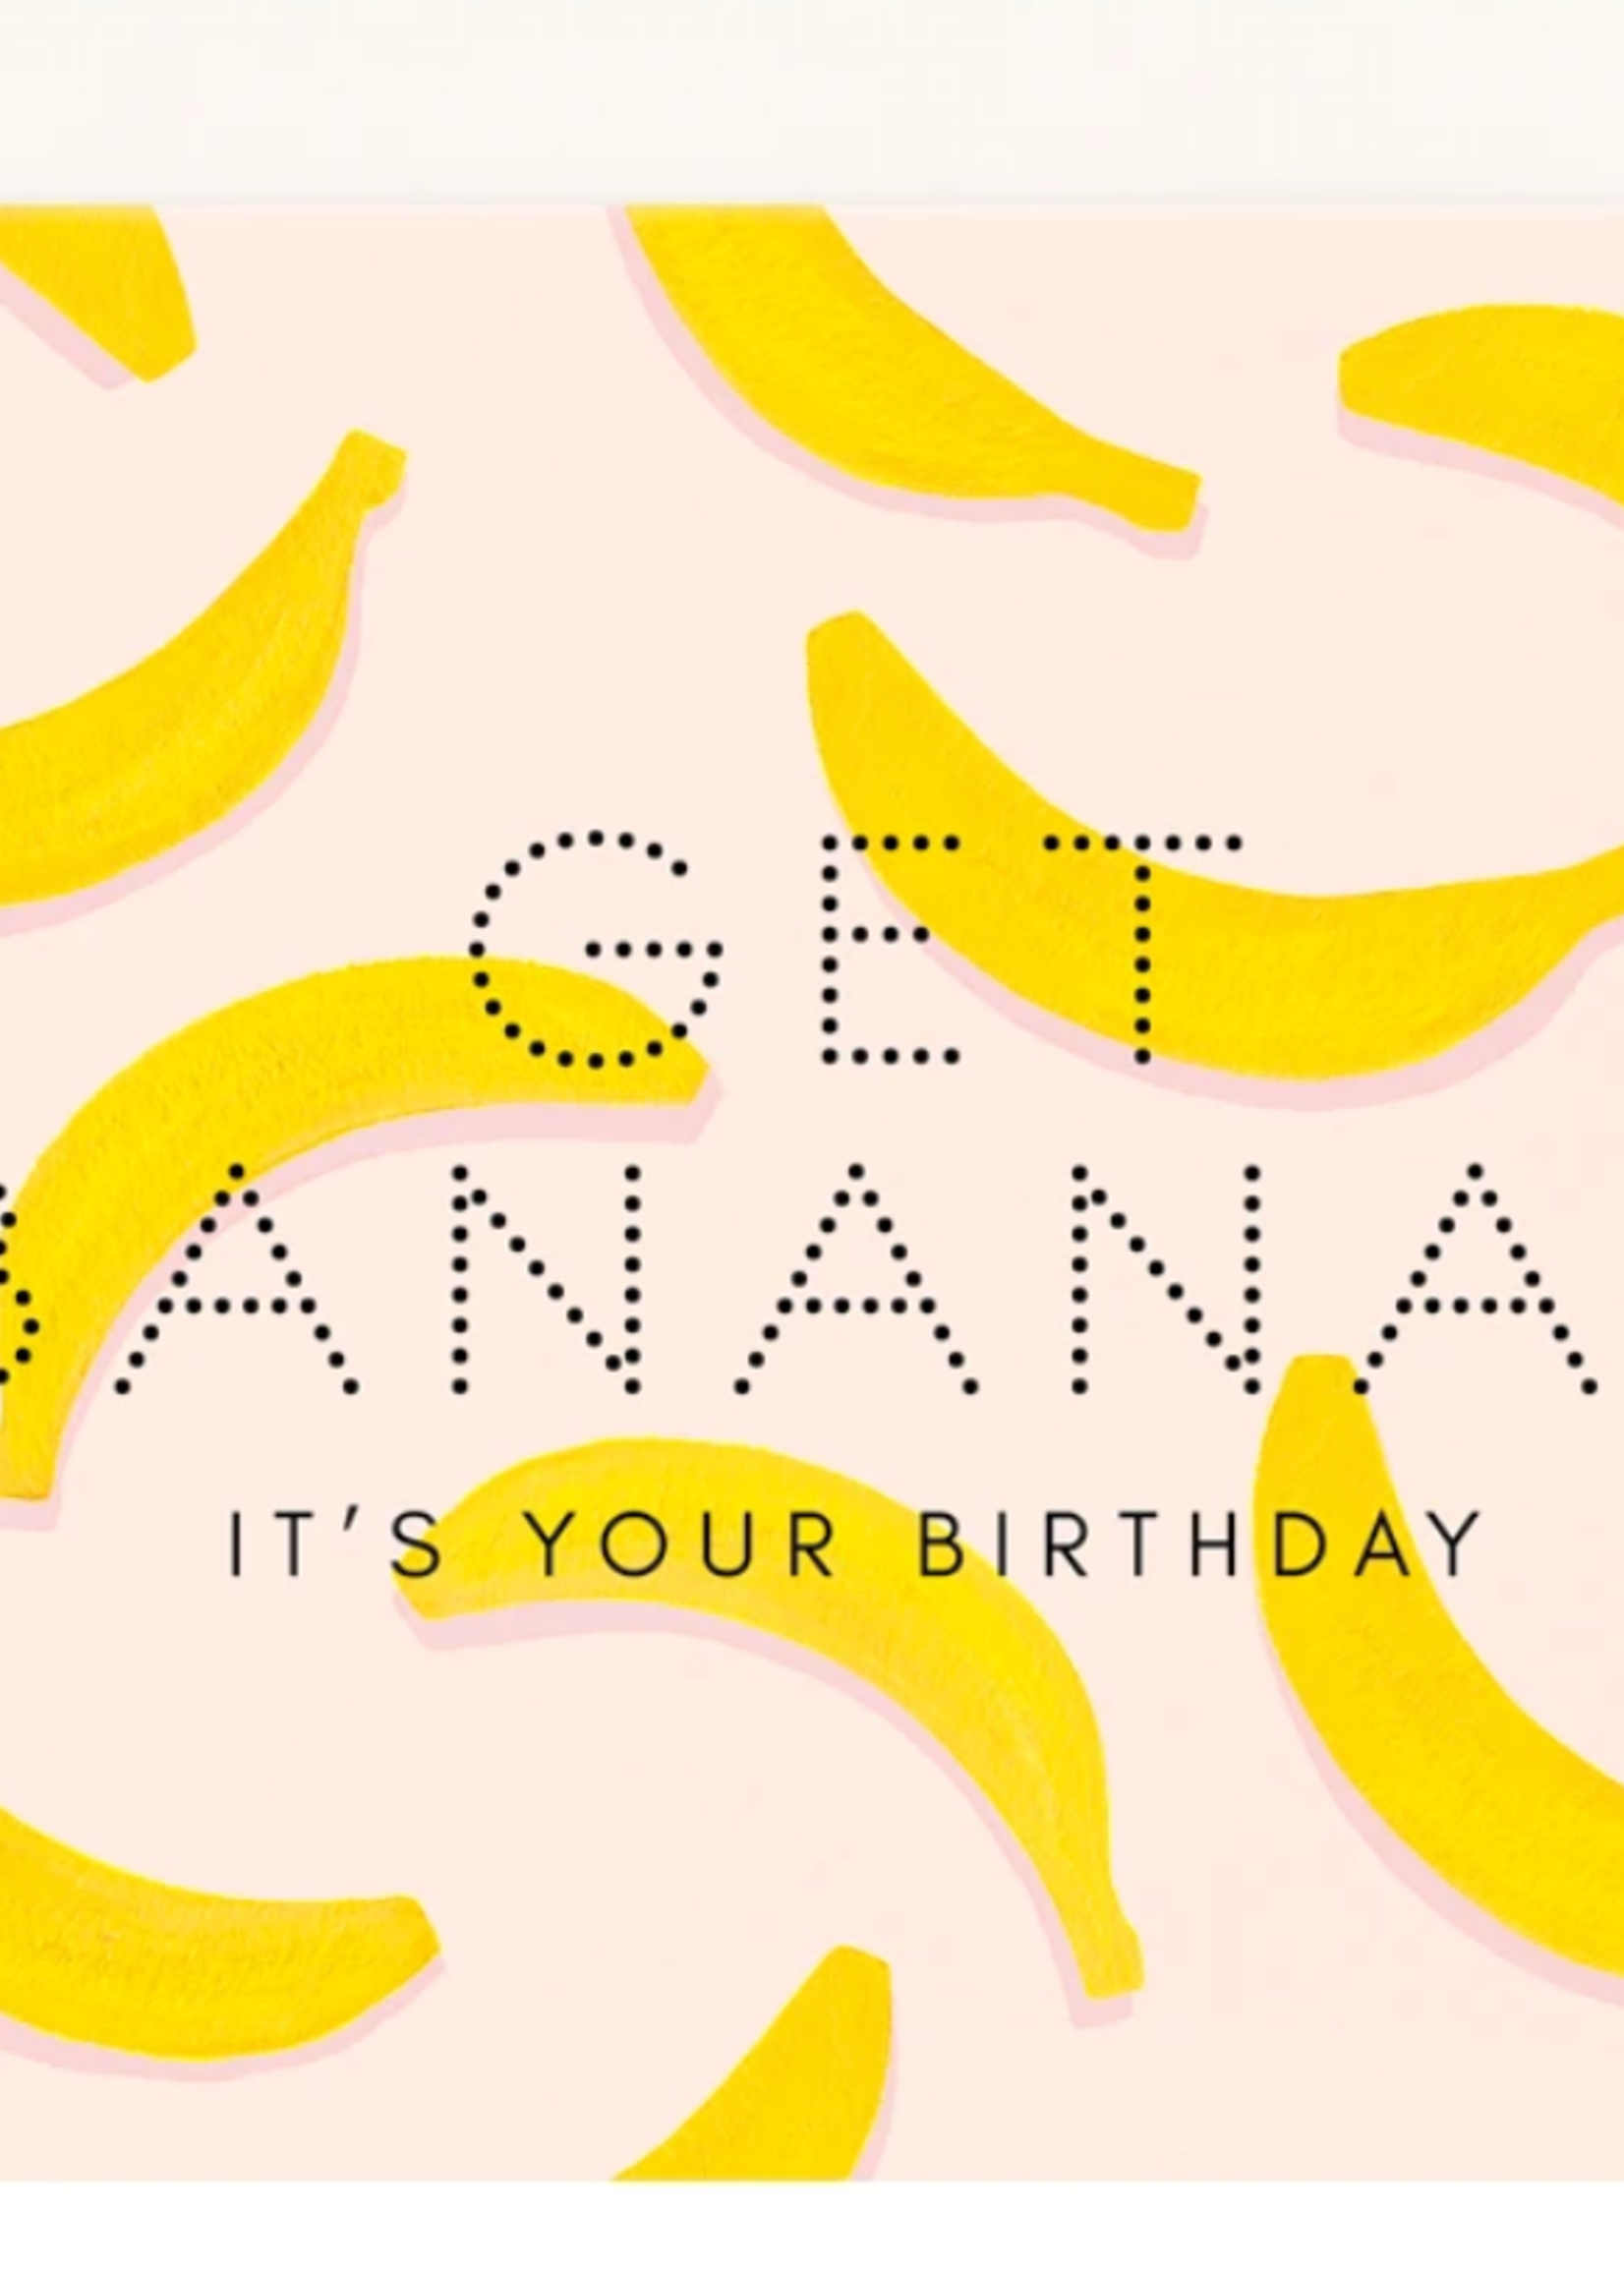 girl w/ knife get bananas birthday card